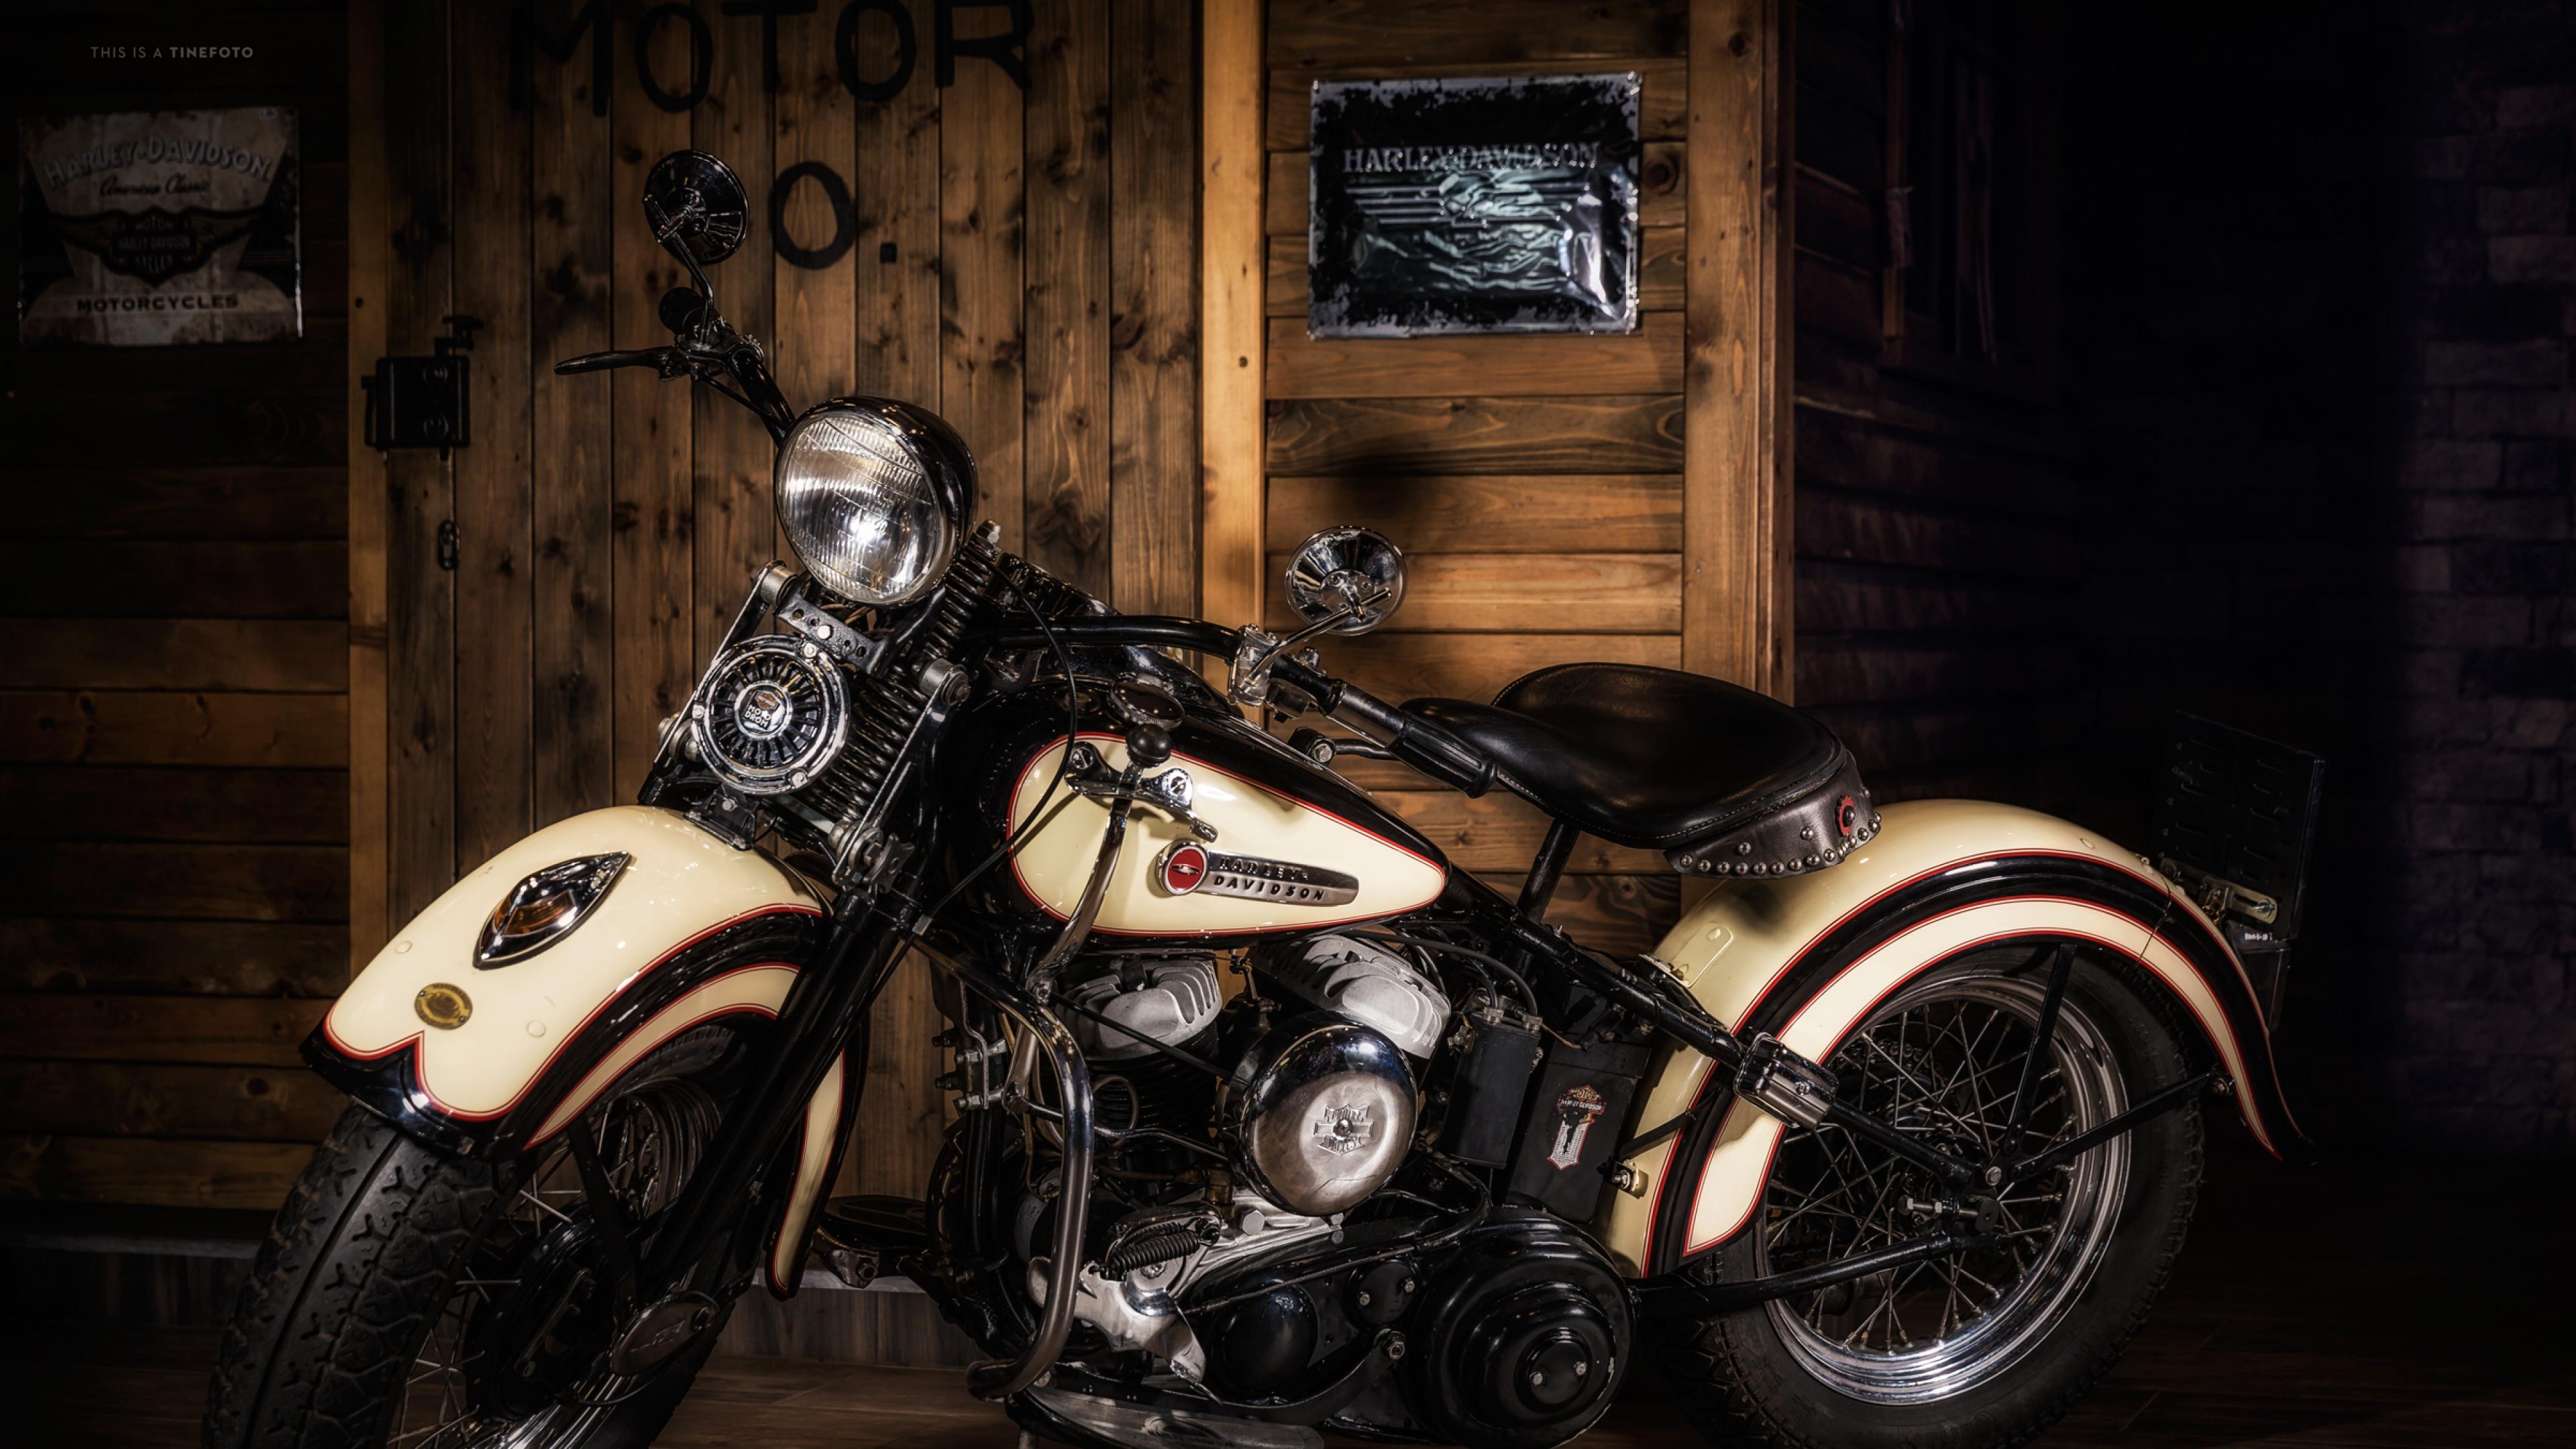 Harley davidson hd bikes 4k wallpapers images - Old school harley davidson wallpaper ...